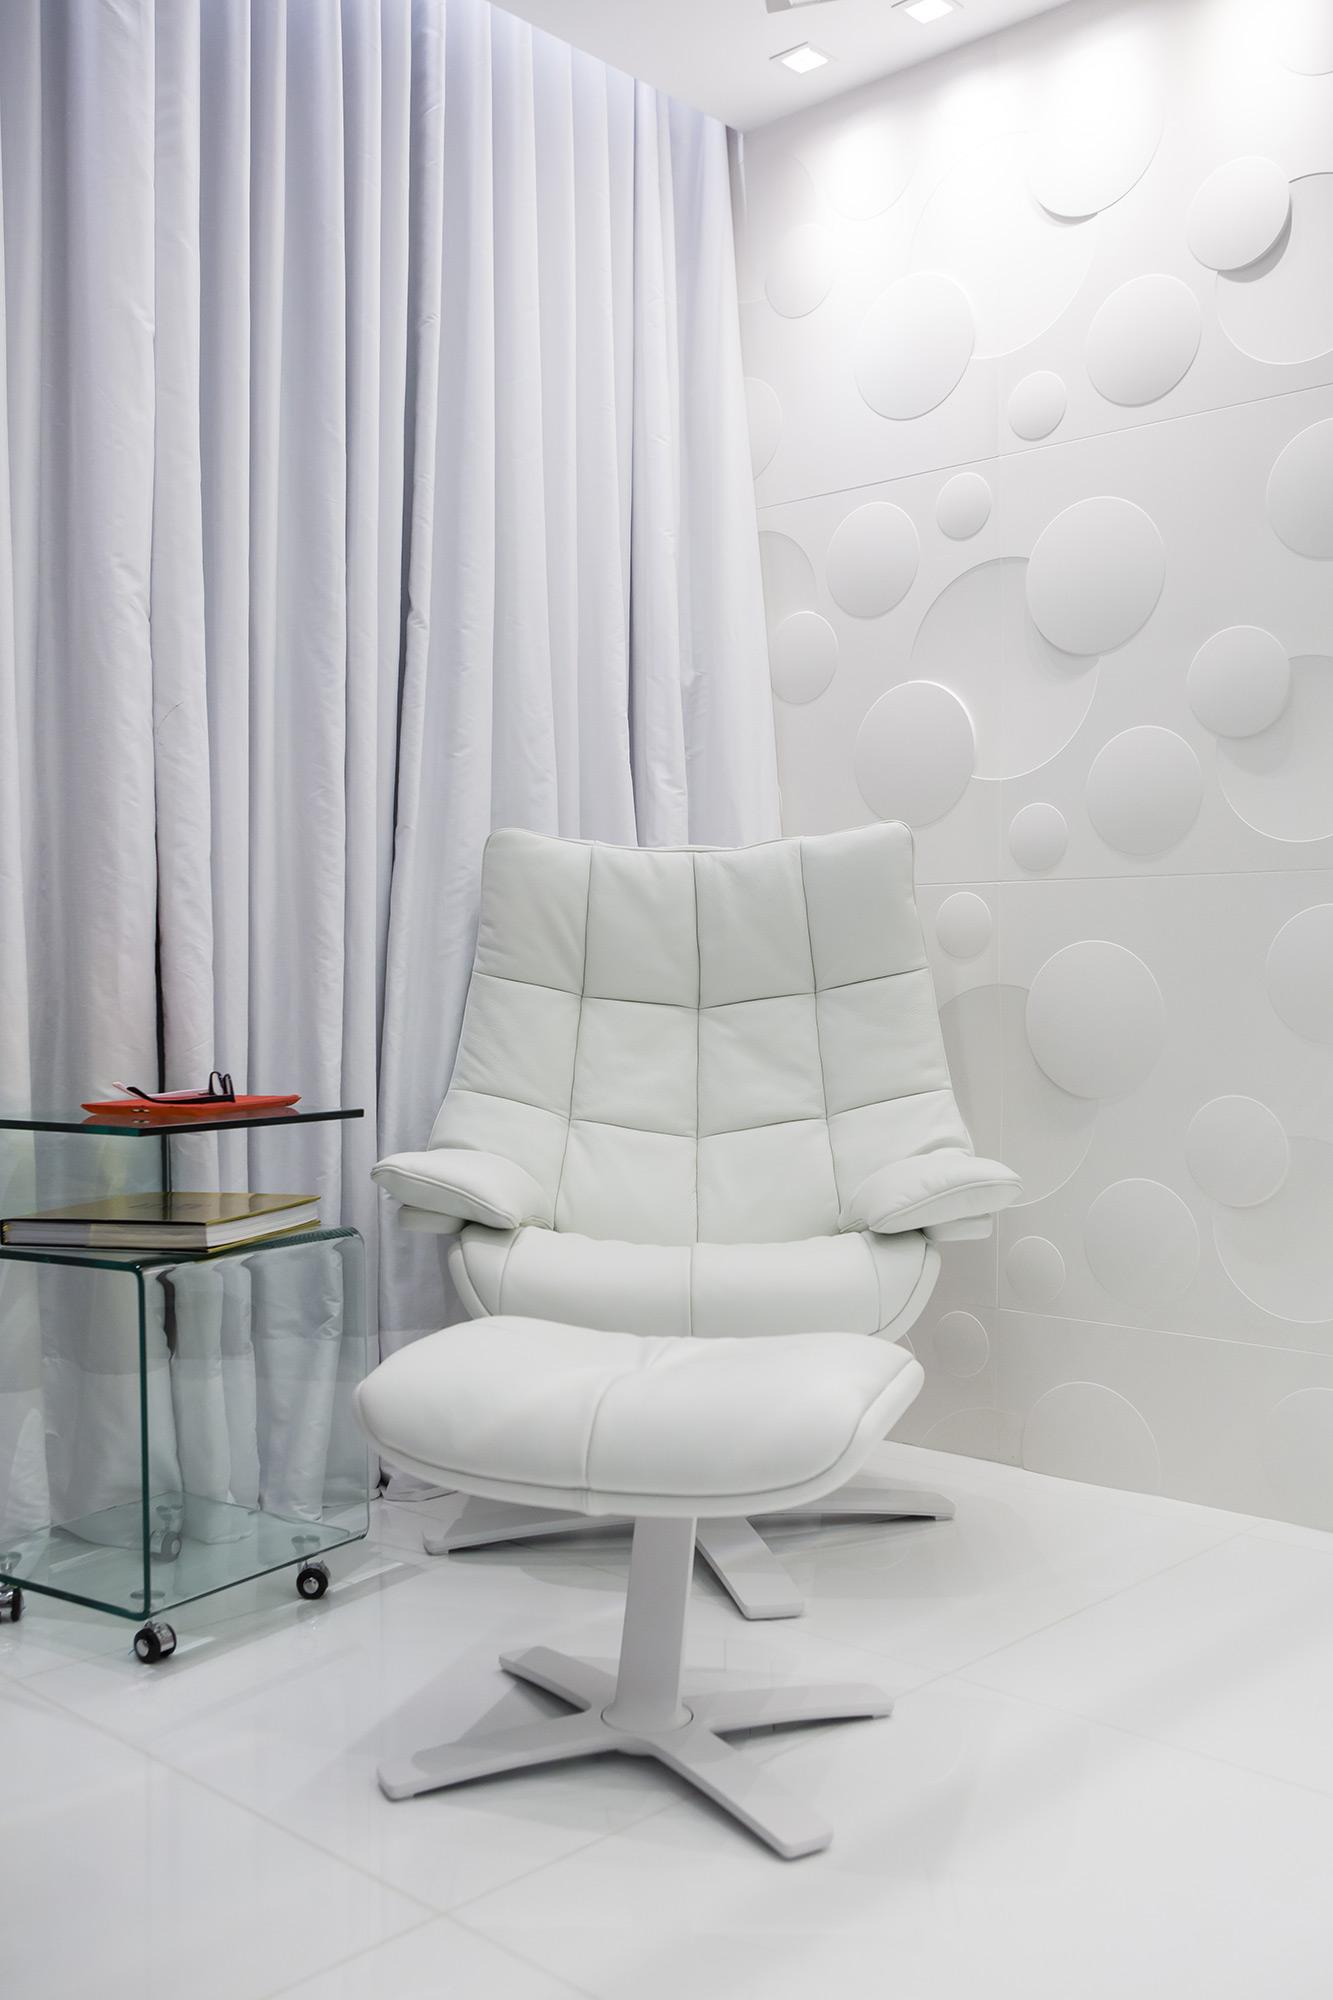 Eclypse Branco - Arquiteta Máira Ritter - Foto Renan Costantin